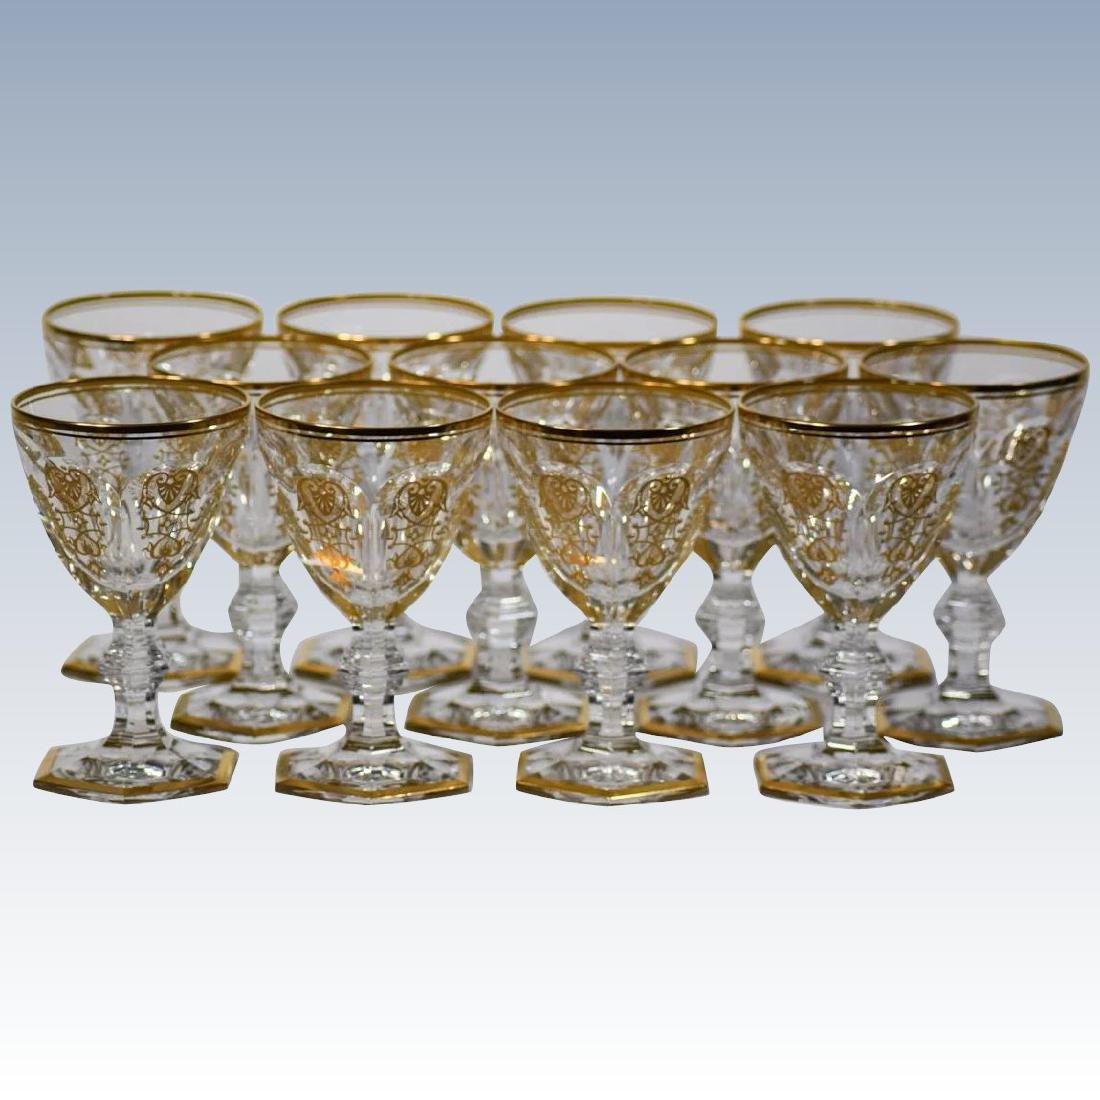 12 Baccarat Gilded Empire Wine Glasses